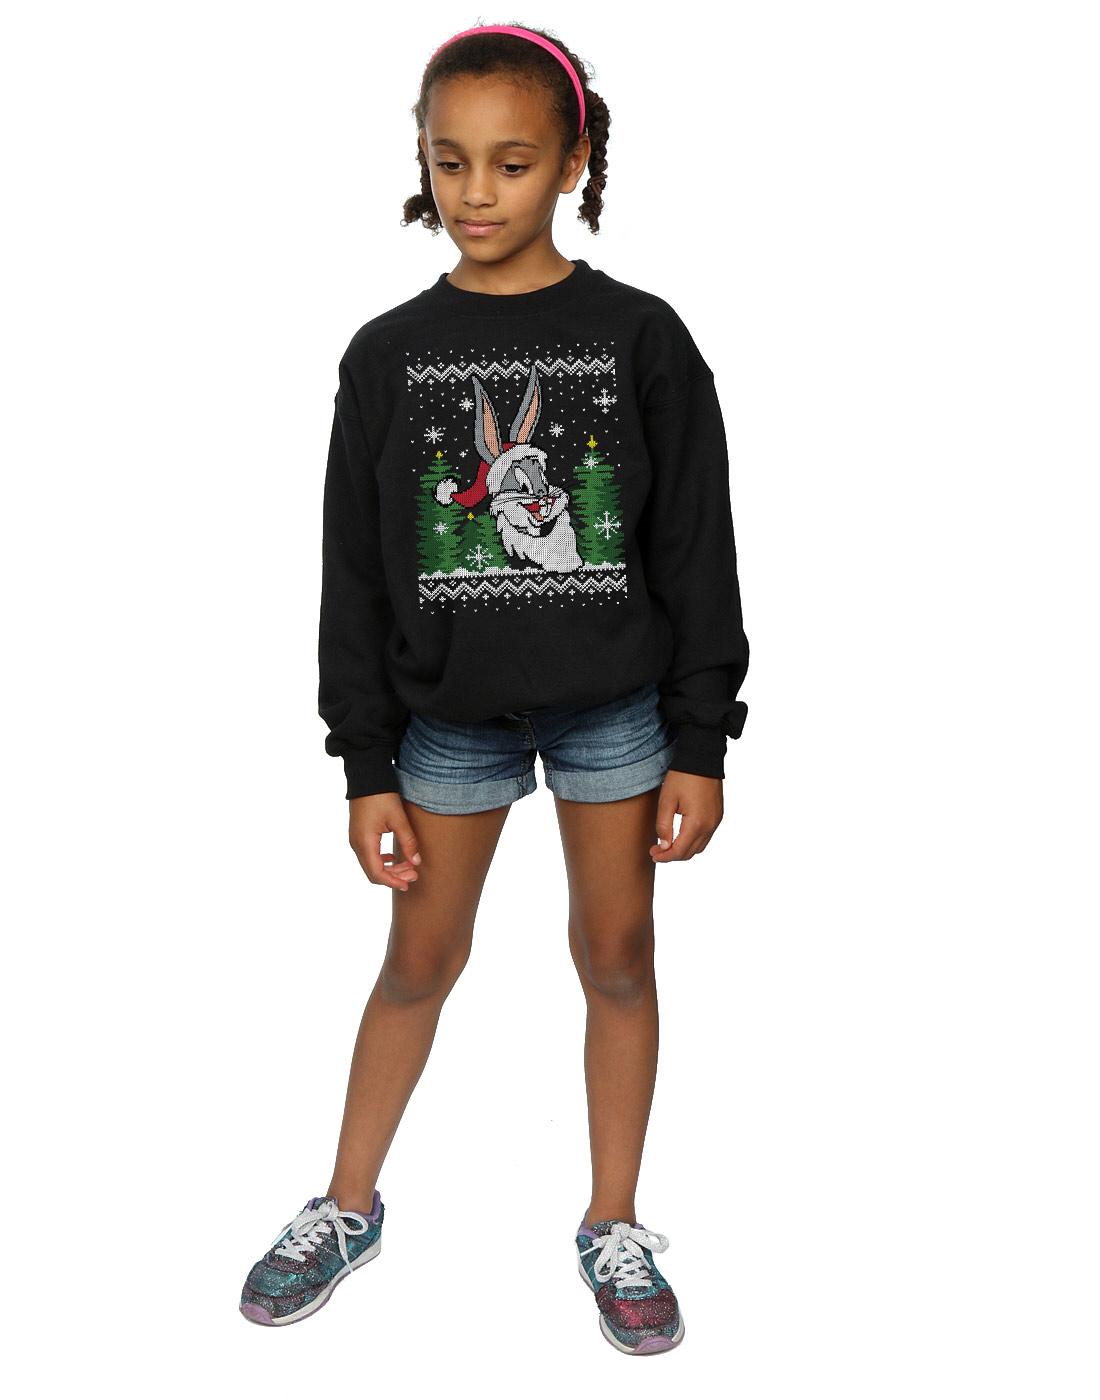 Absolute Cult Looney Tunes Girls Christmas Postcard Sweatshirt